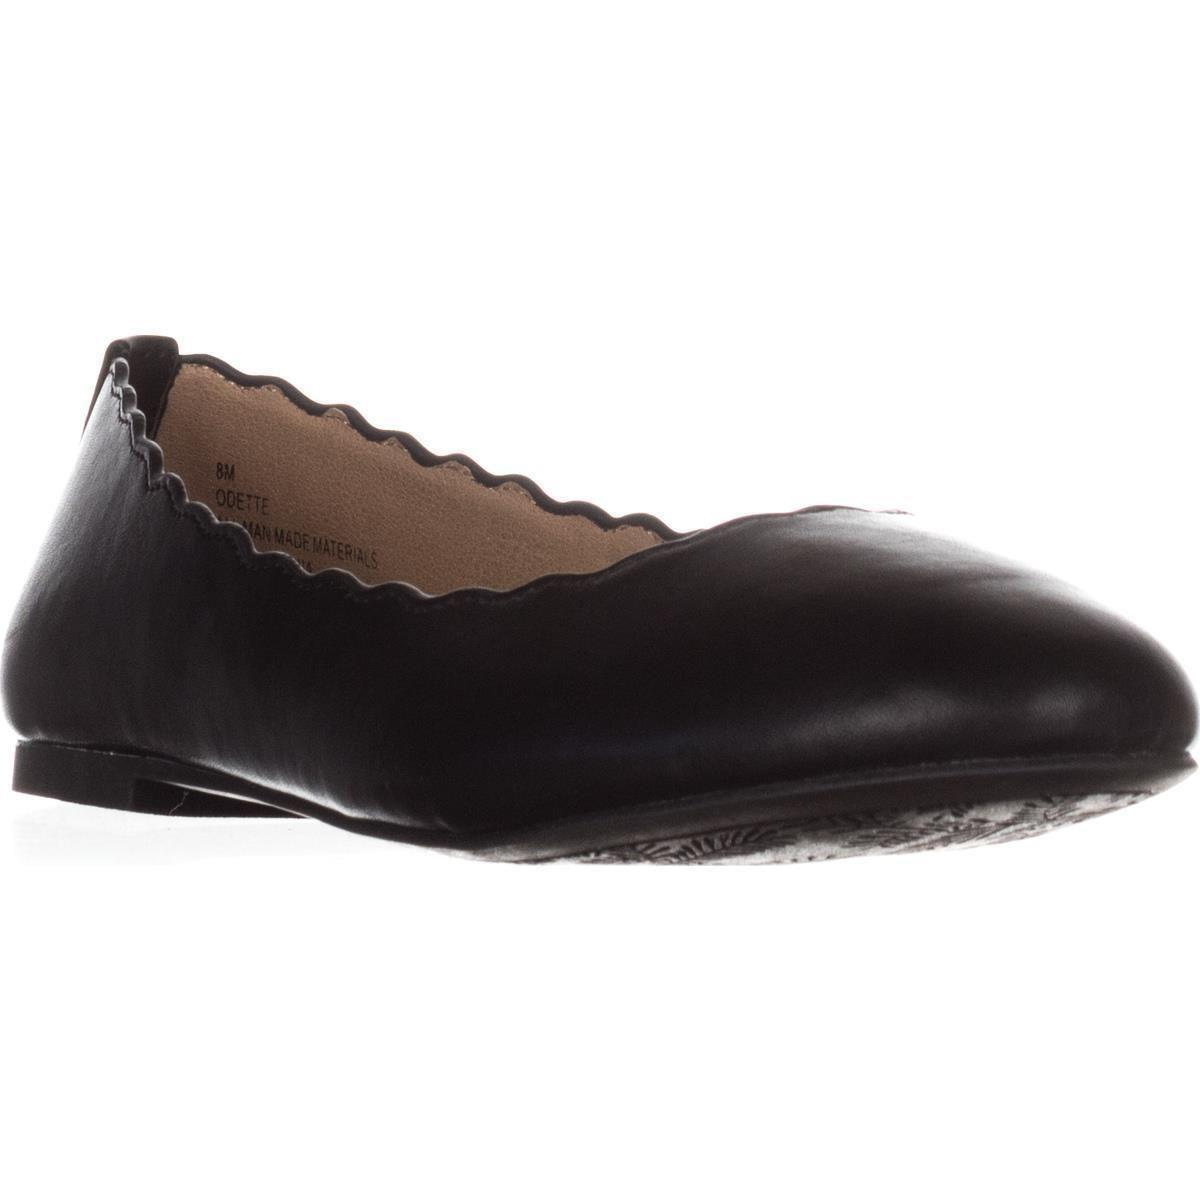 eac55556f7d6 Lyst - Esprit Odette Scalloped Edge Ballet Flats in Black - Save 12%